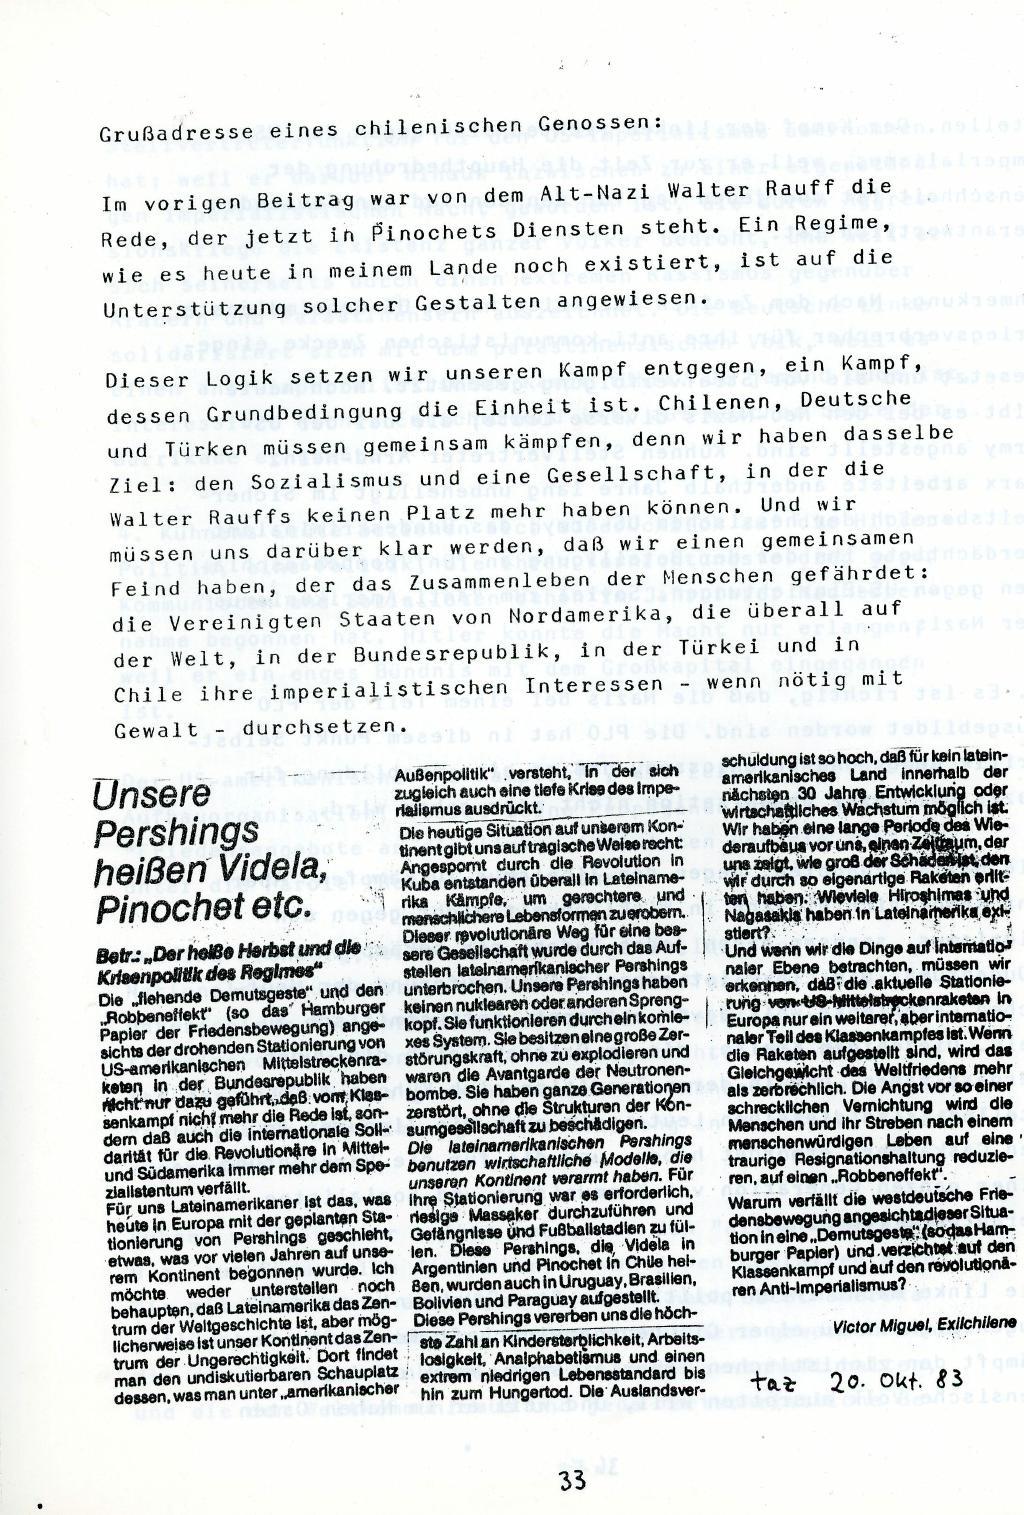 Berlin_1983_Autonome_Gruppen_Faschismus_im_Kapitalismus_33